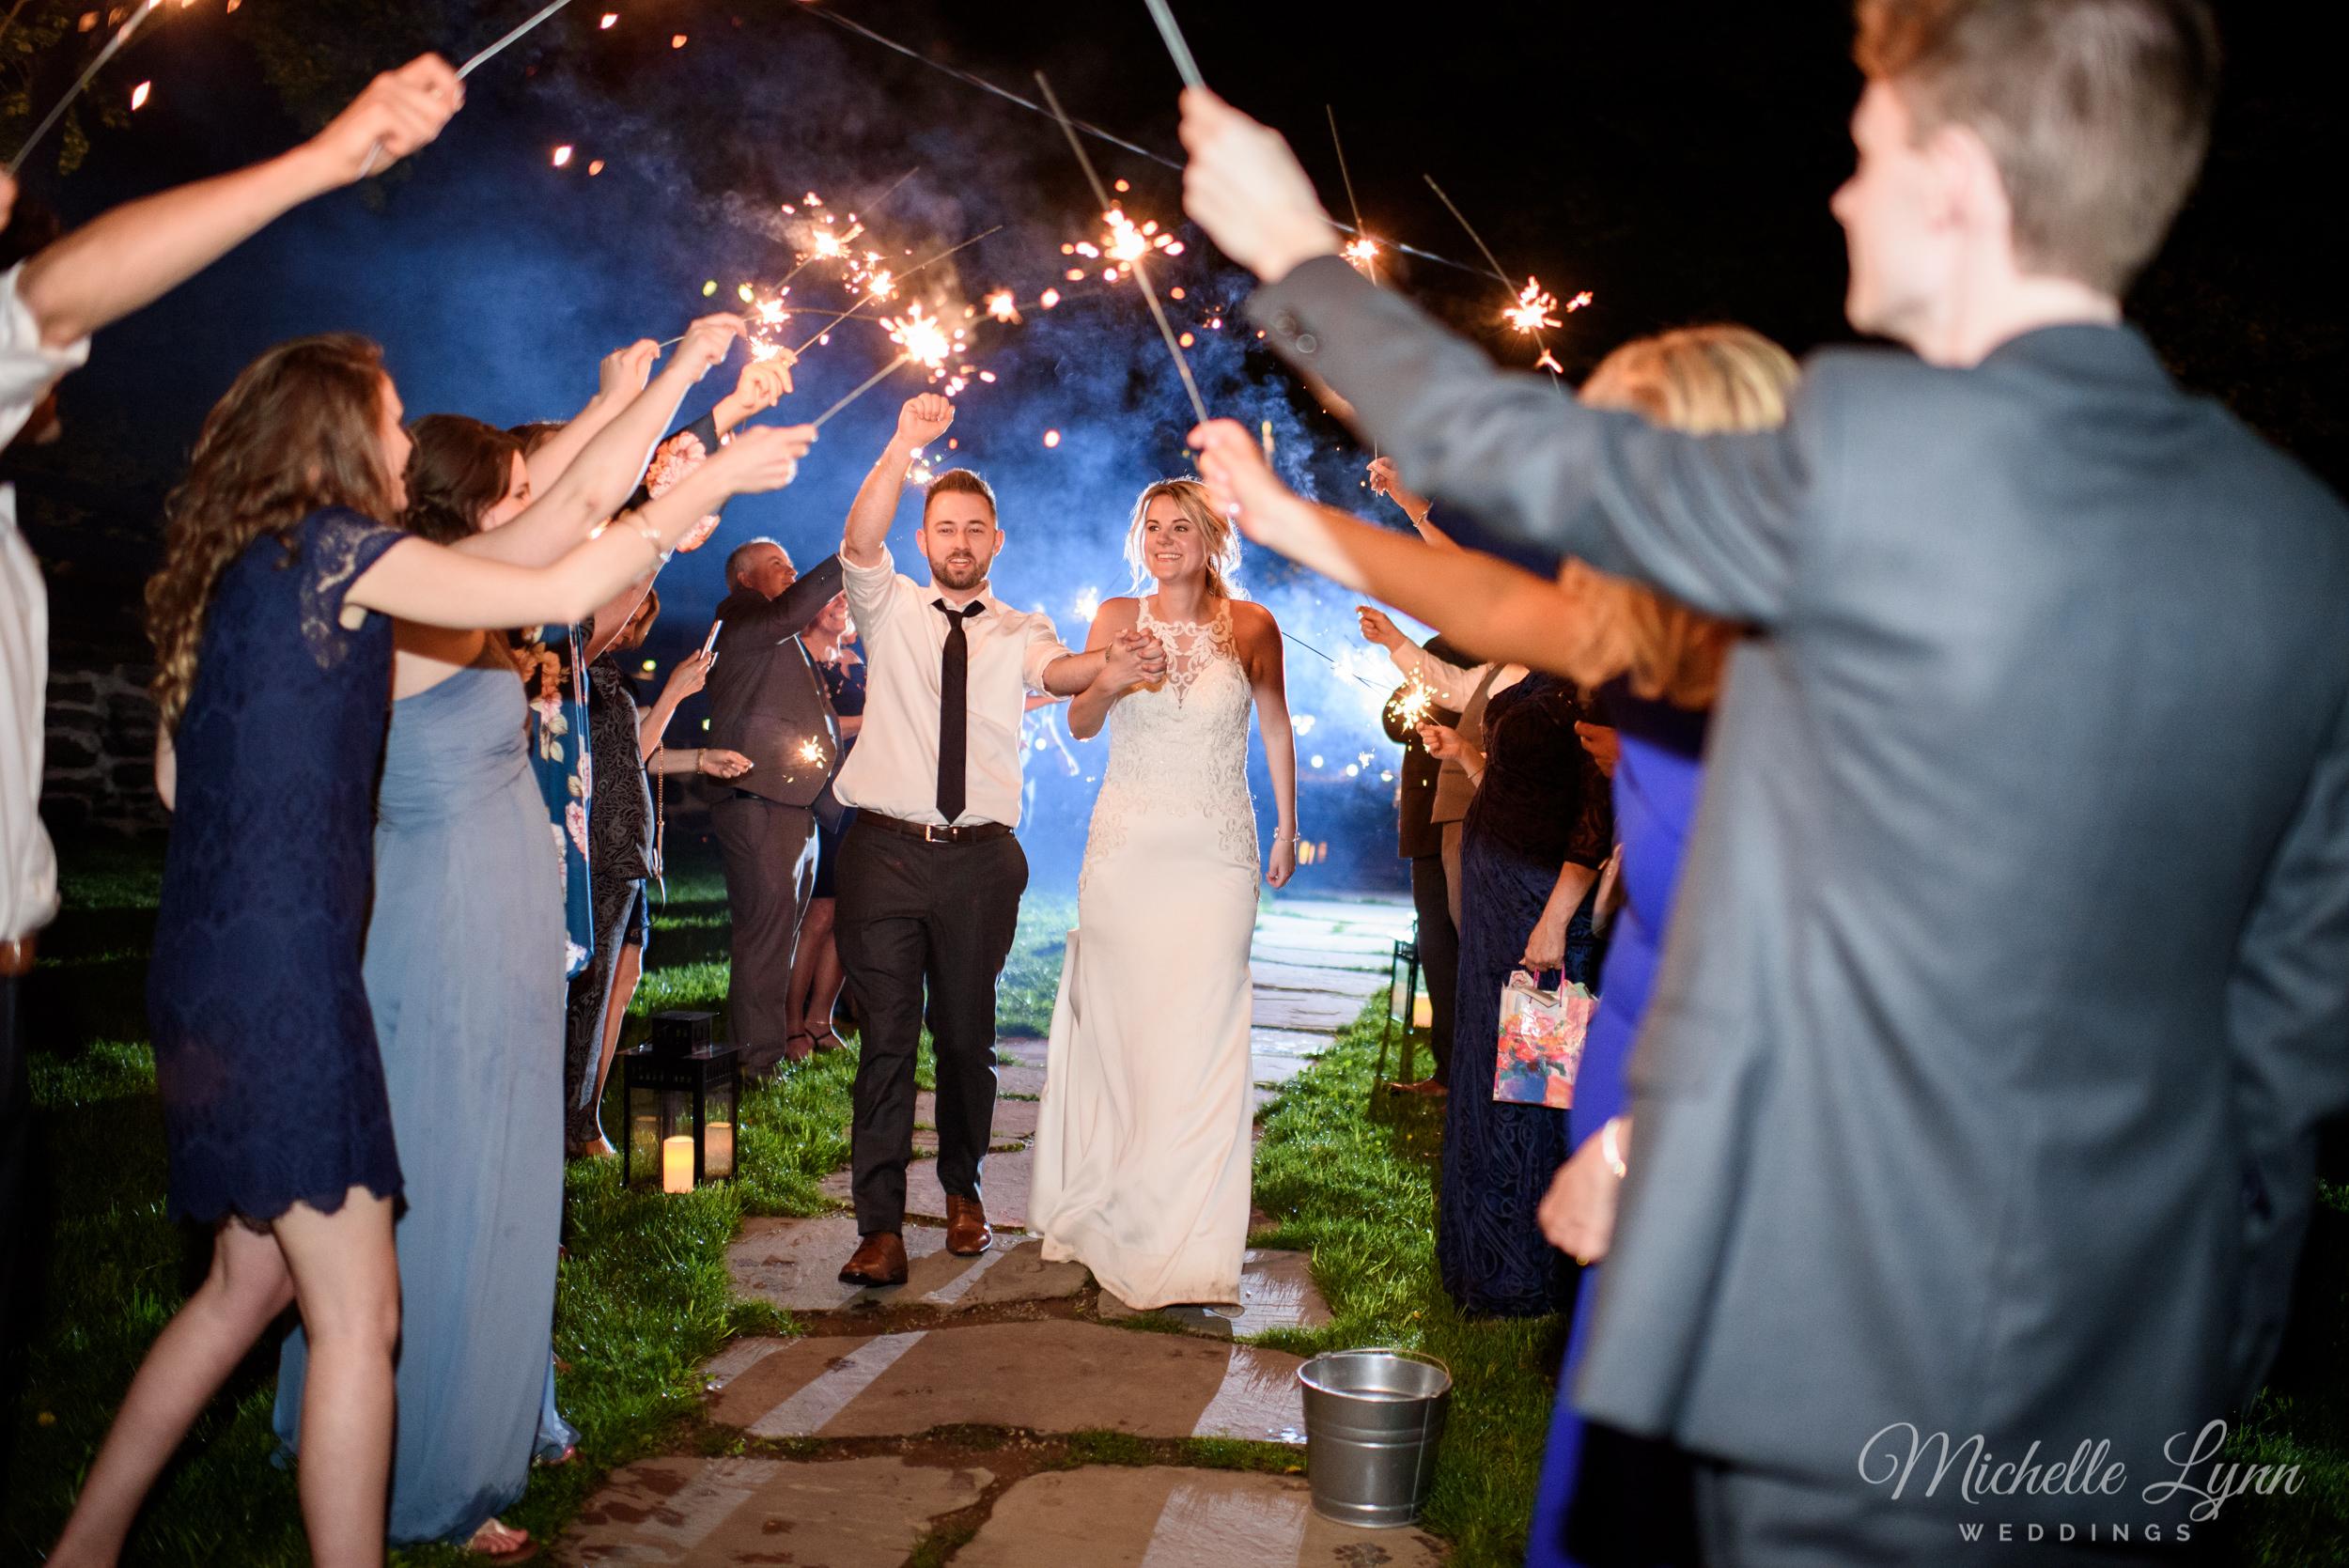 mlw-the-farm-bakery-and-events-wedding-photos-98.jpg